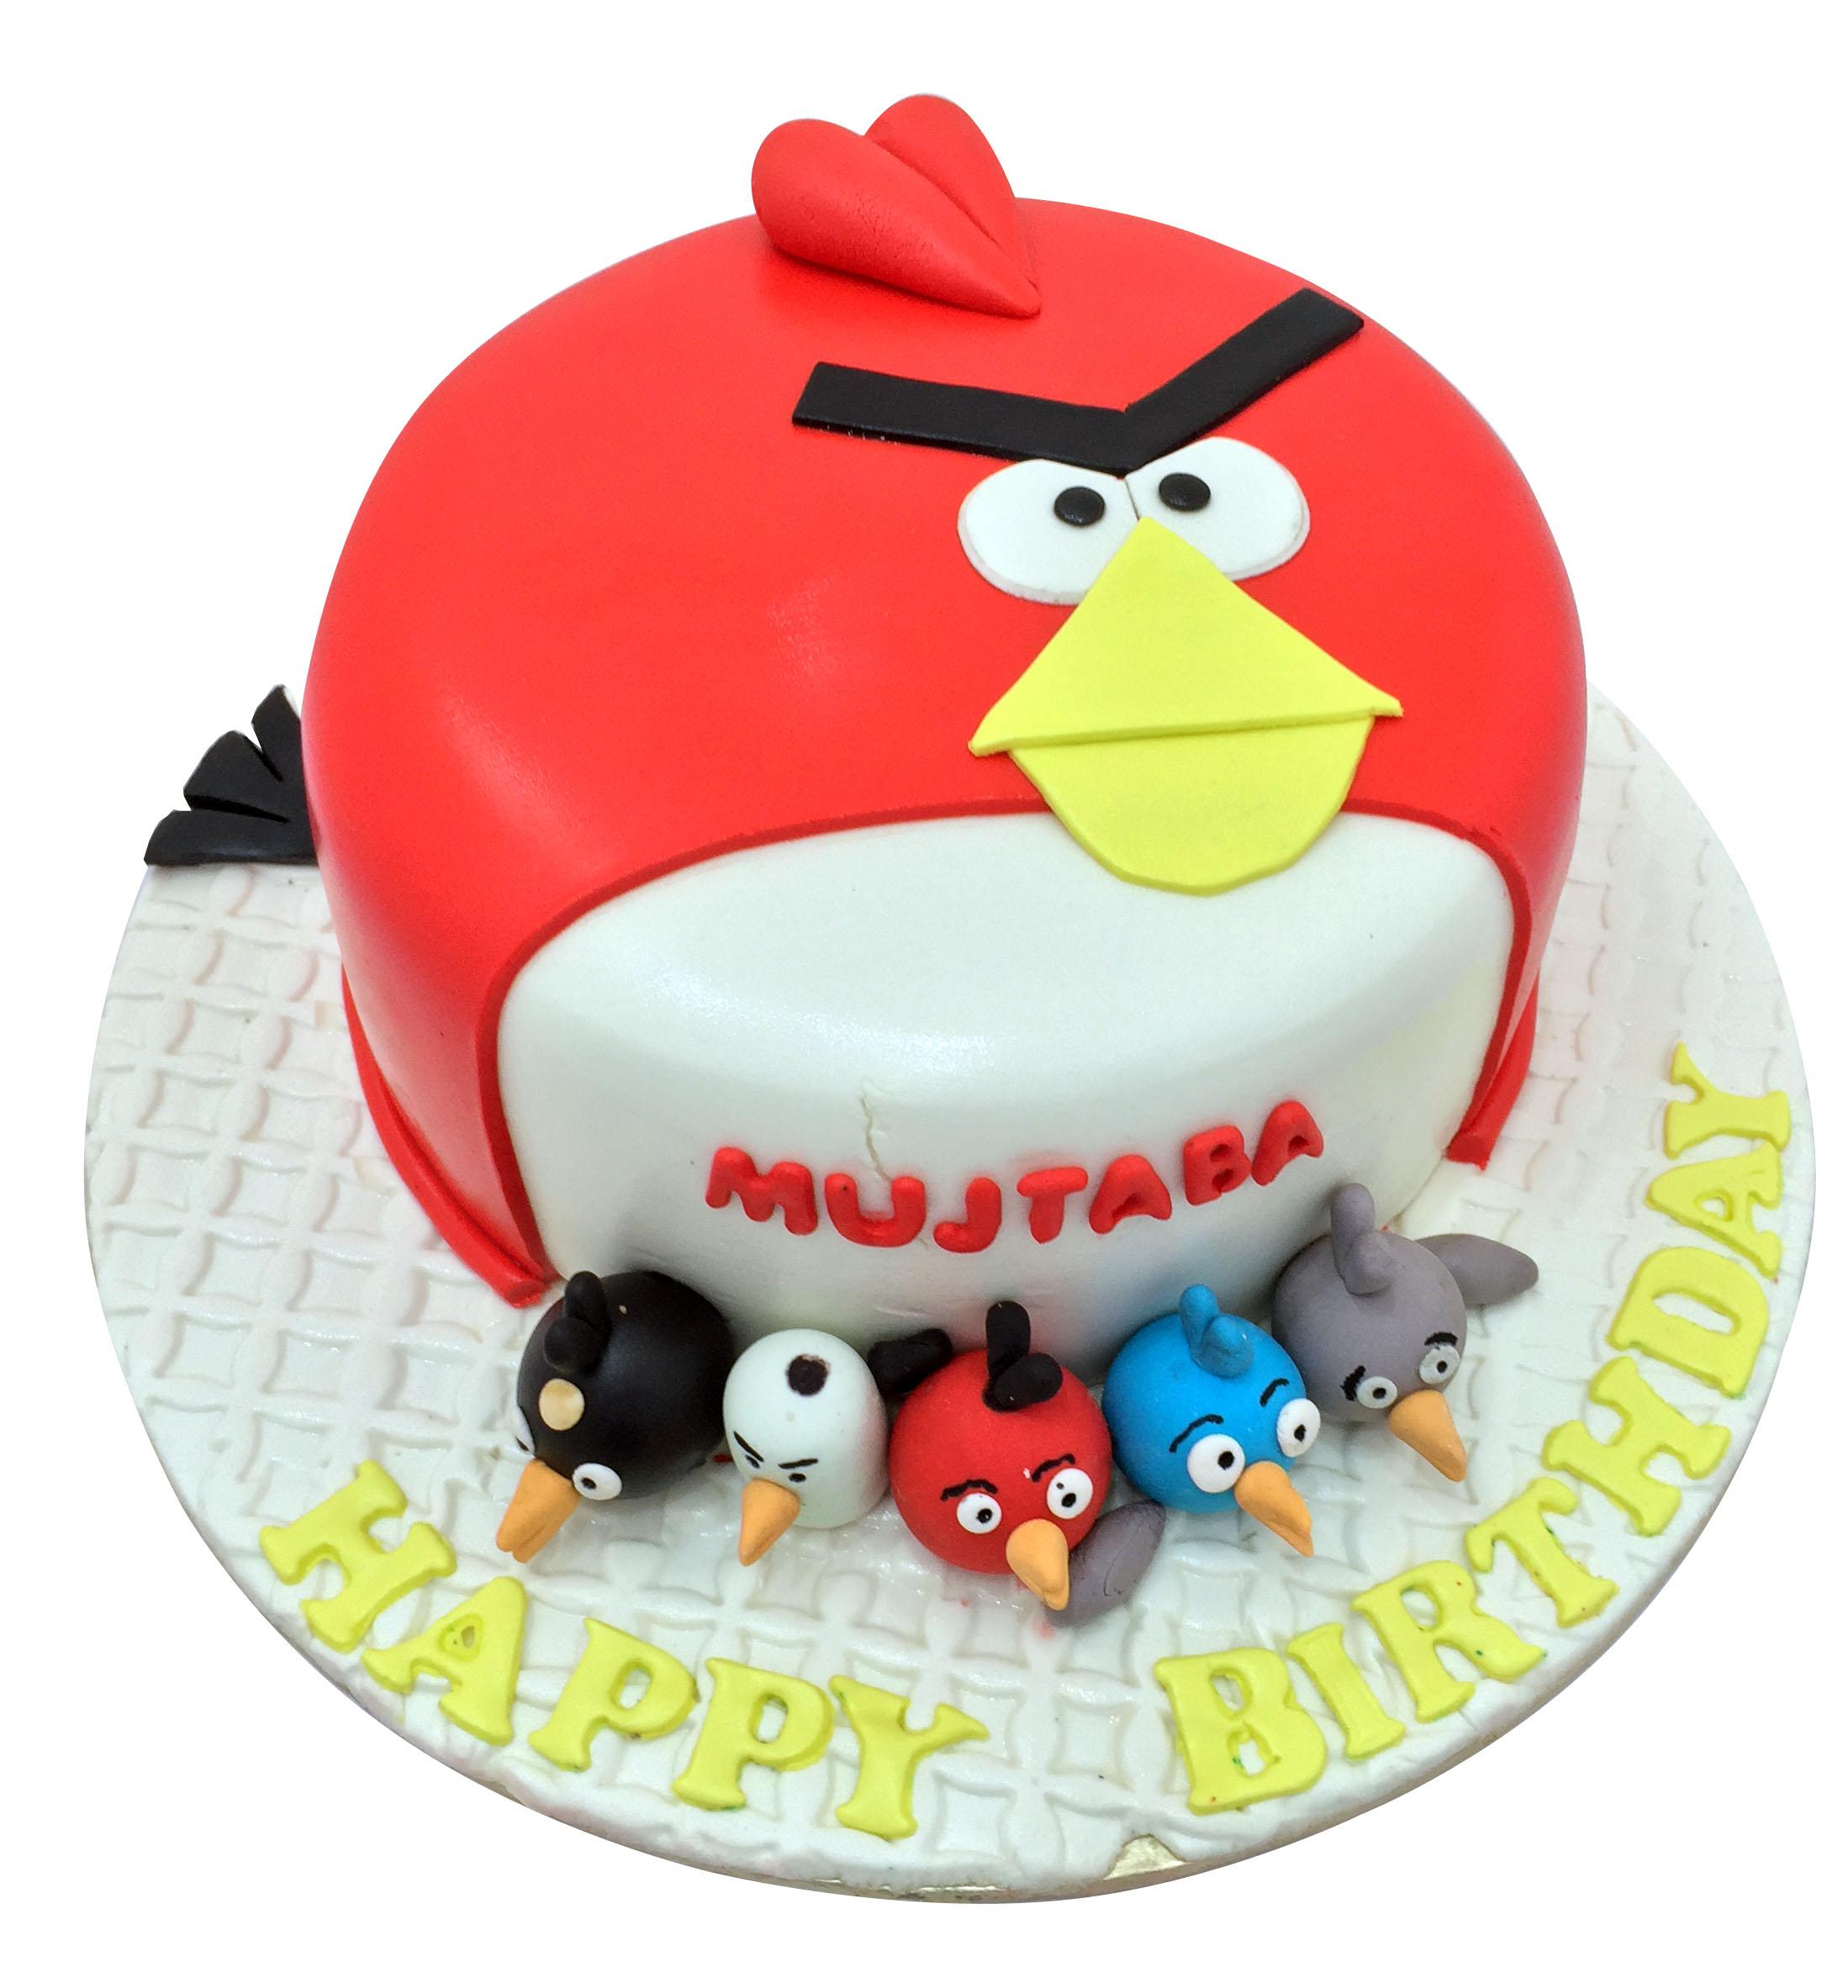 Strange Angry Bird Birthday Cake Angry Bird Photo Cakes In Lahore Funny Birthday Cards Online Alyptdamsfinfo